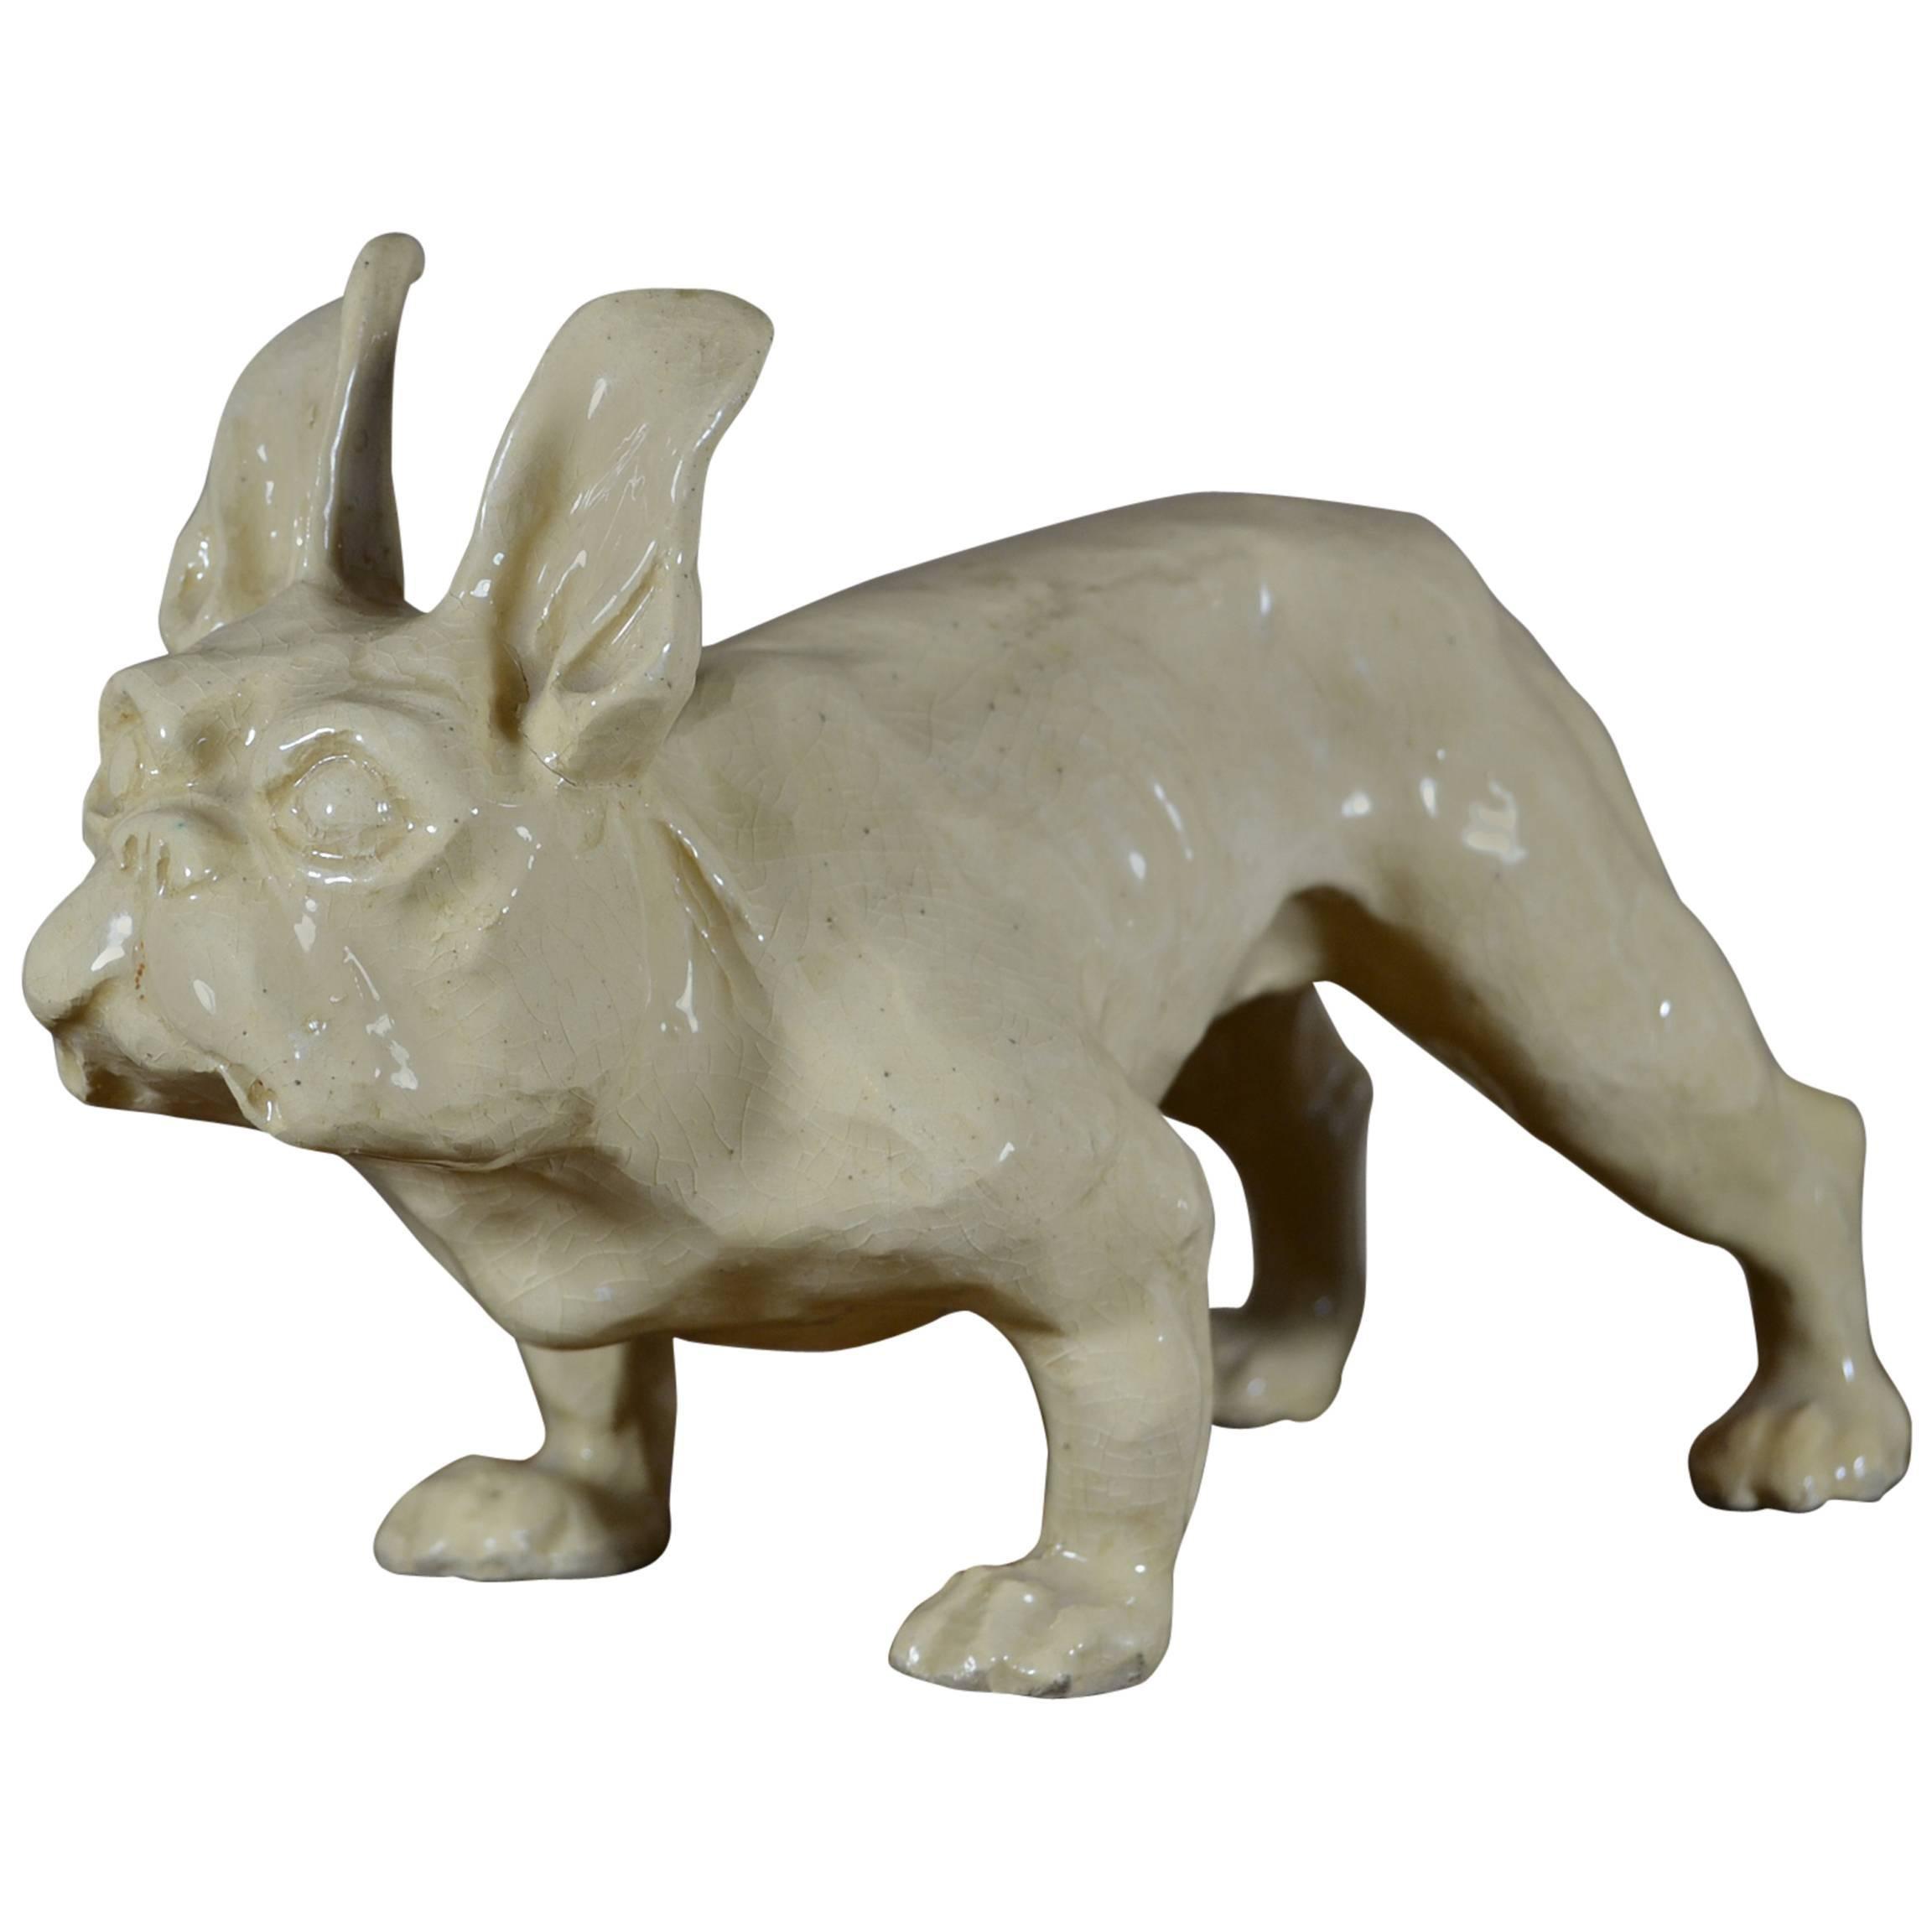 Art Deco Ceramic French Bulldog Sculpture